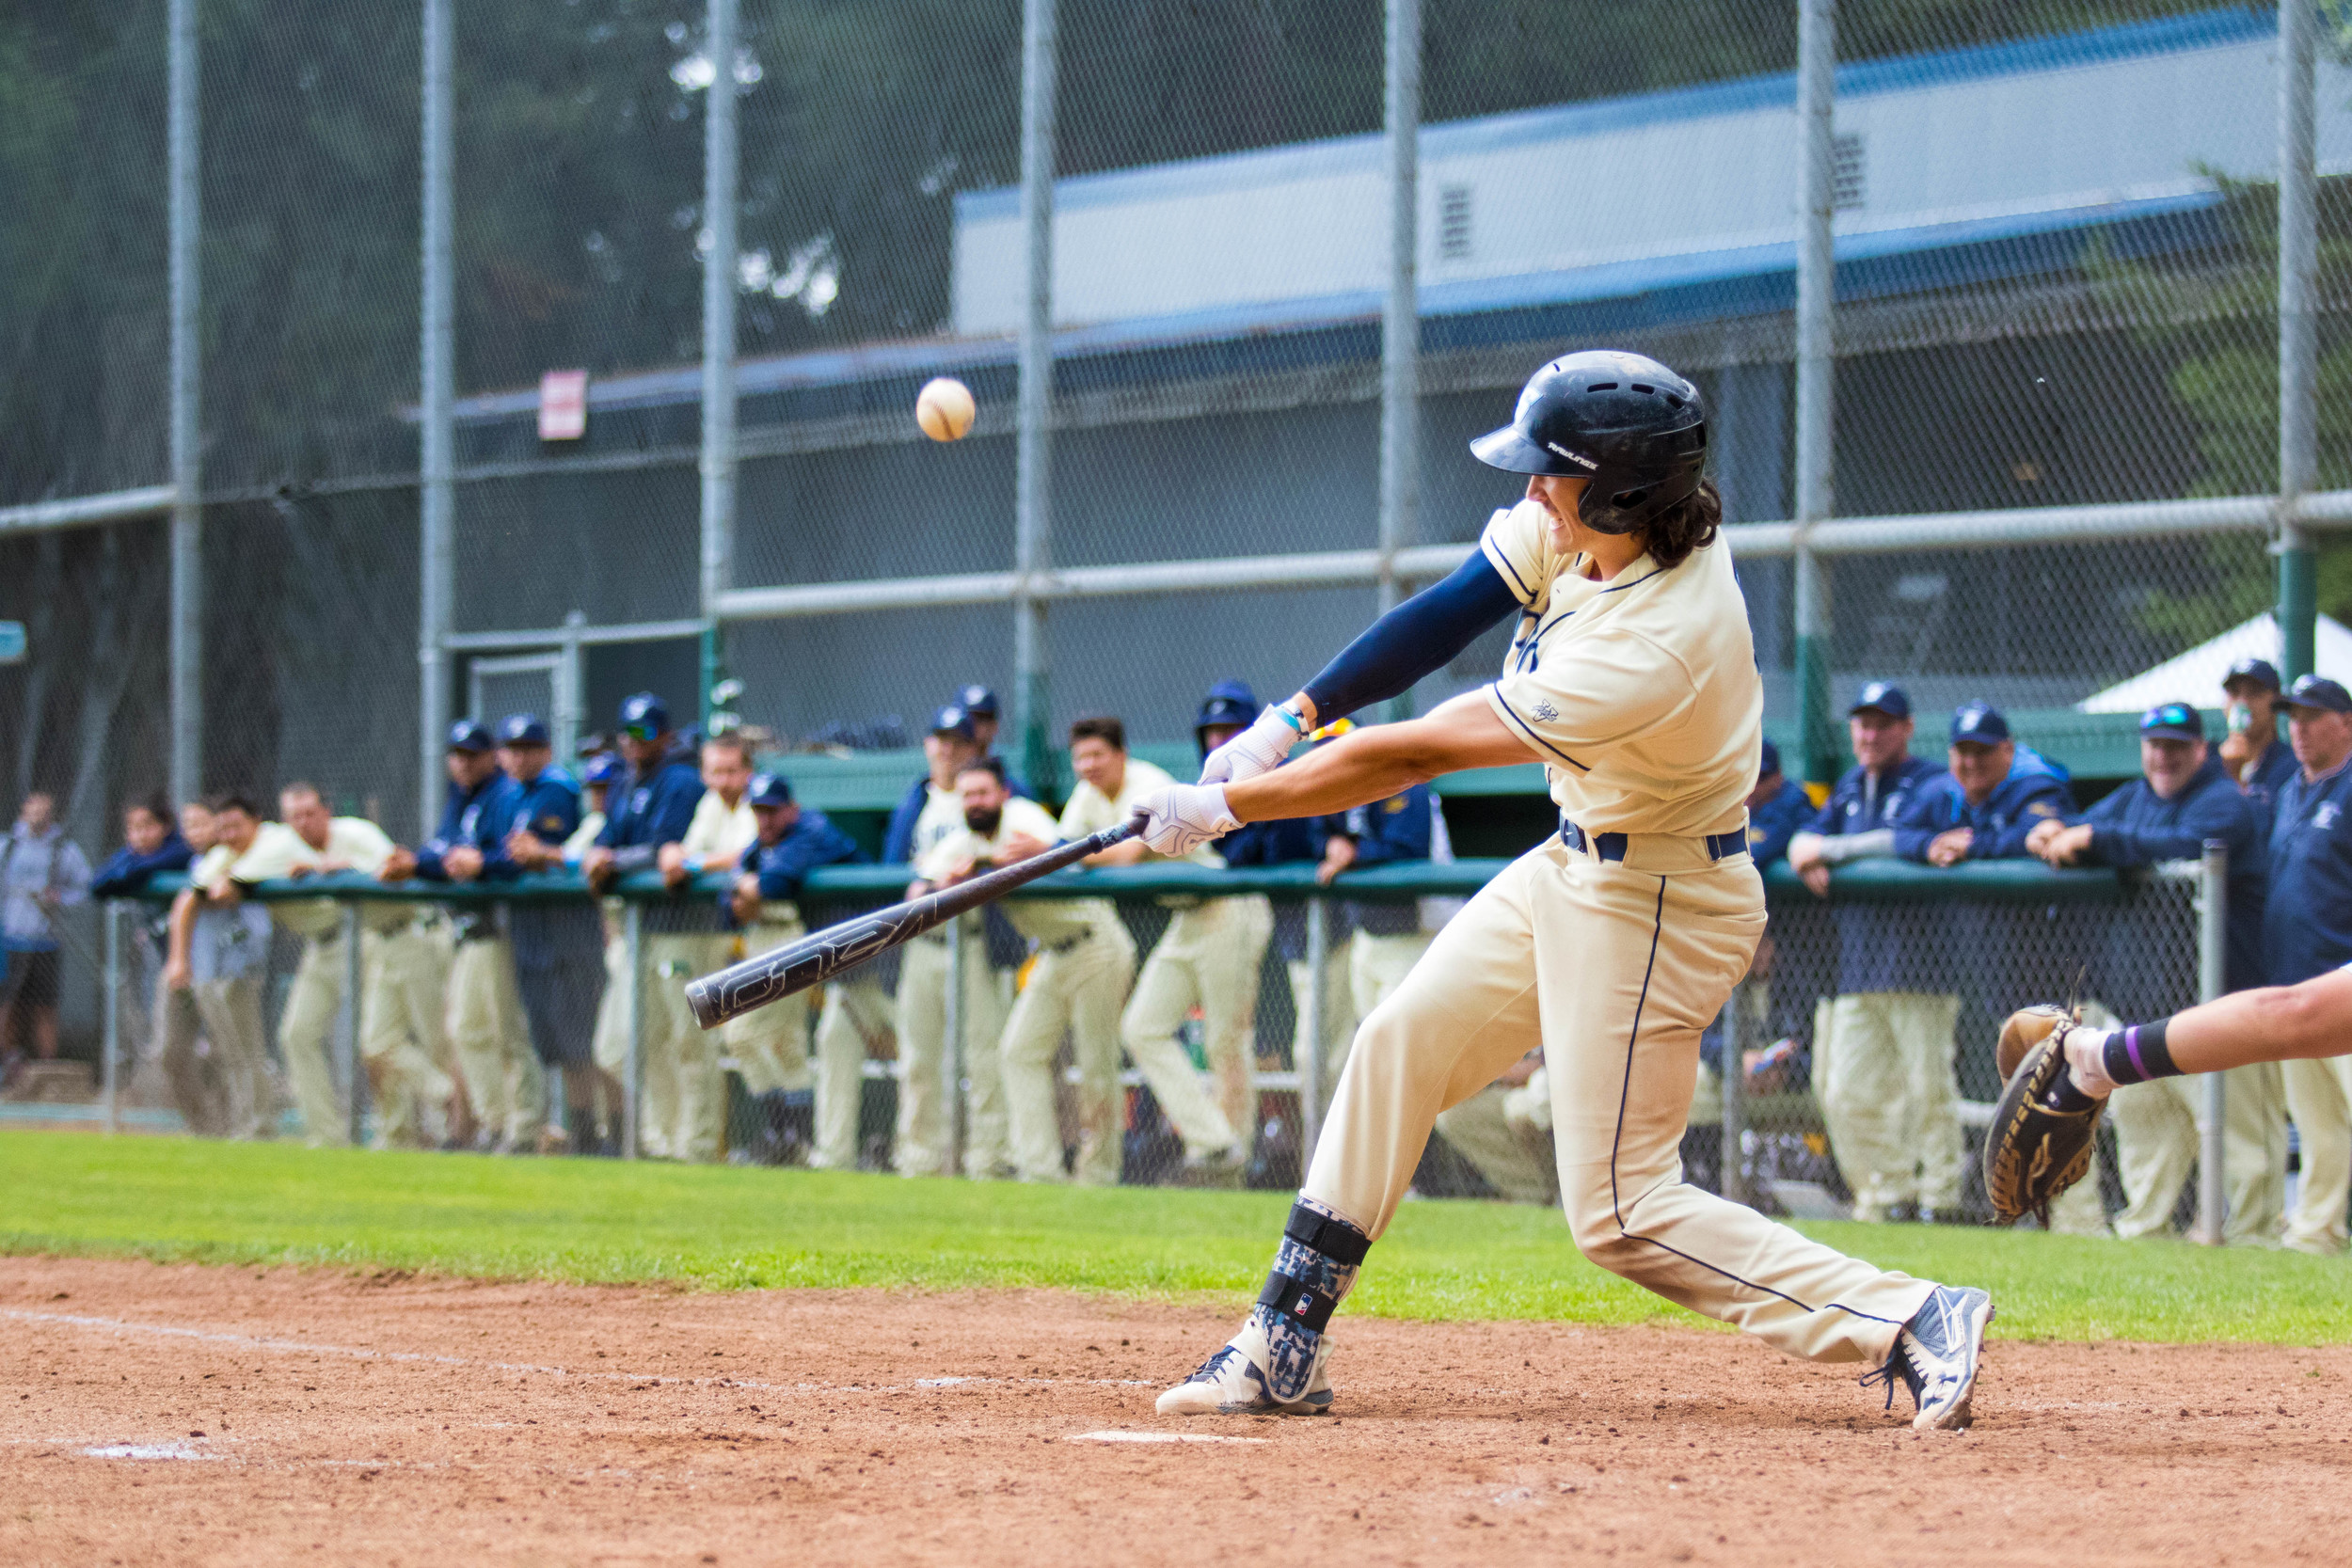 SSU Baseball team up to bat